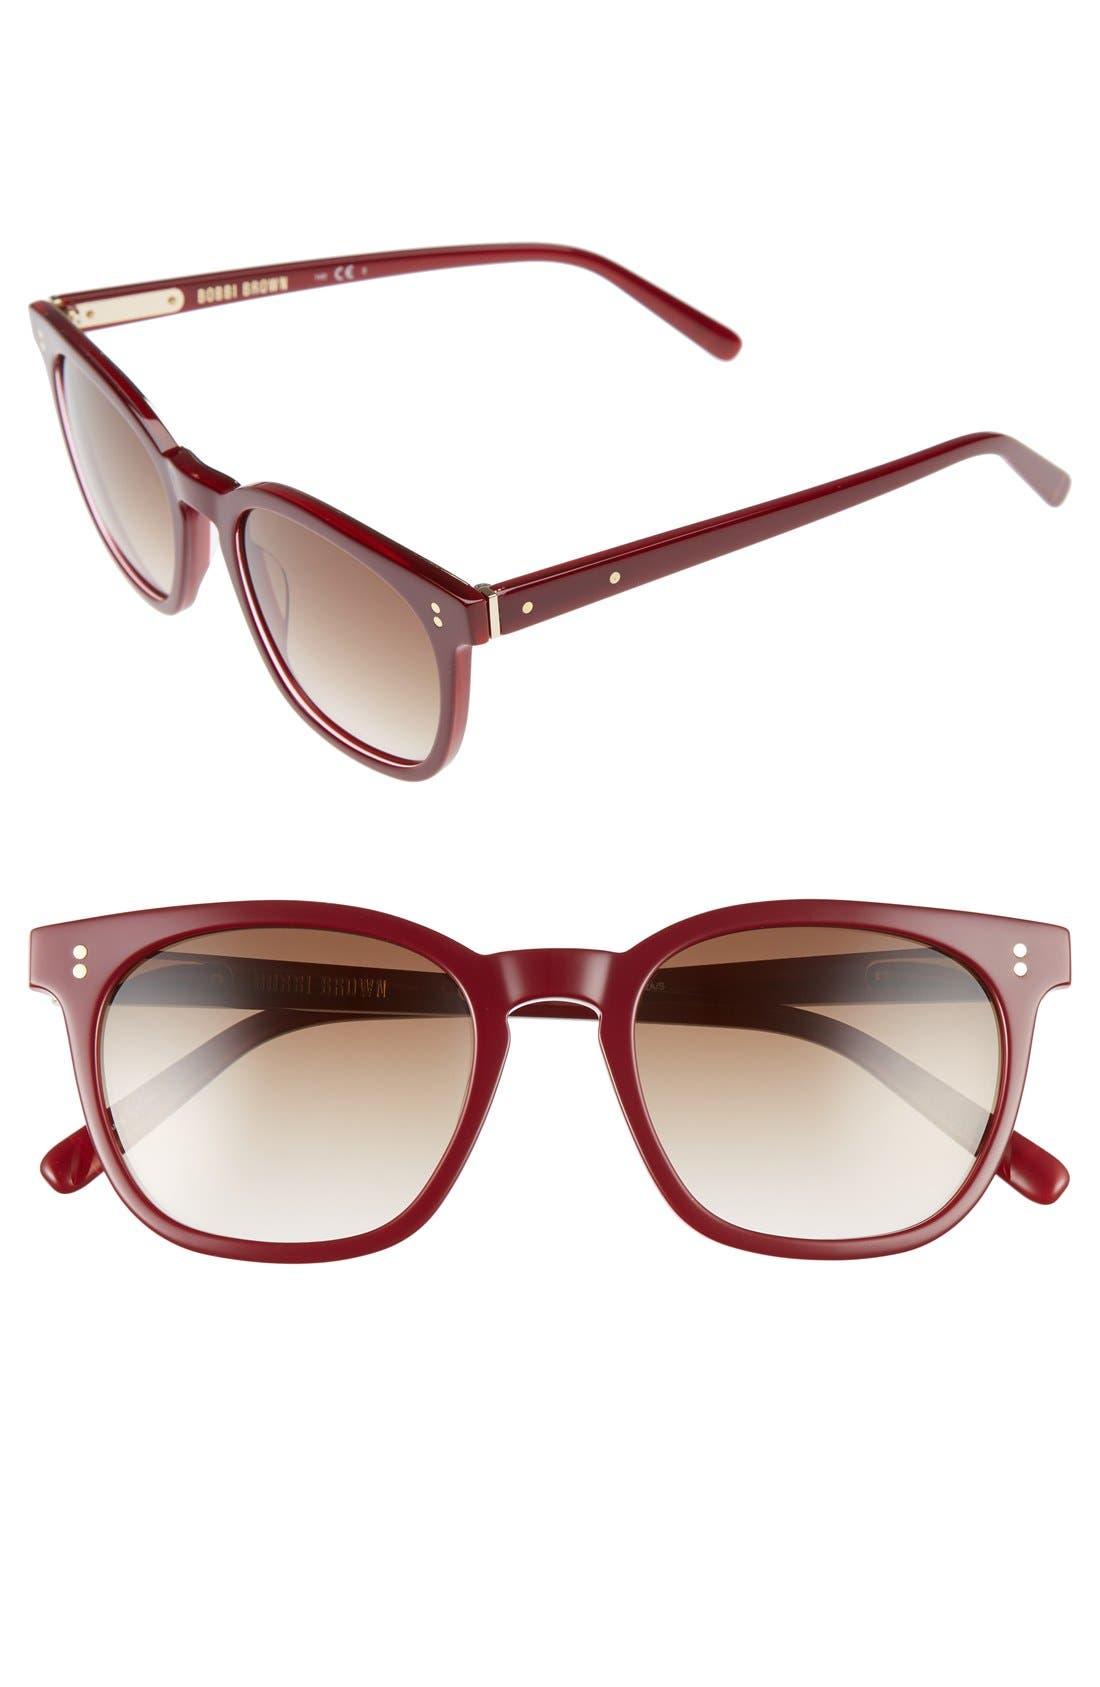 Main Image - Bobbi Brown The Cassandra 50mm Sunglasses